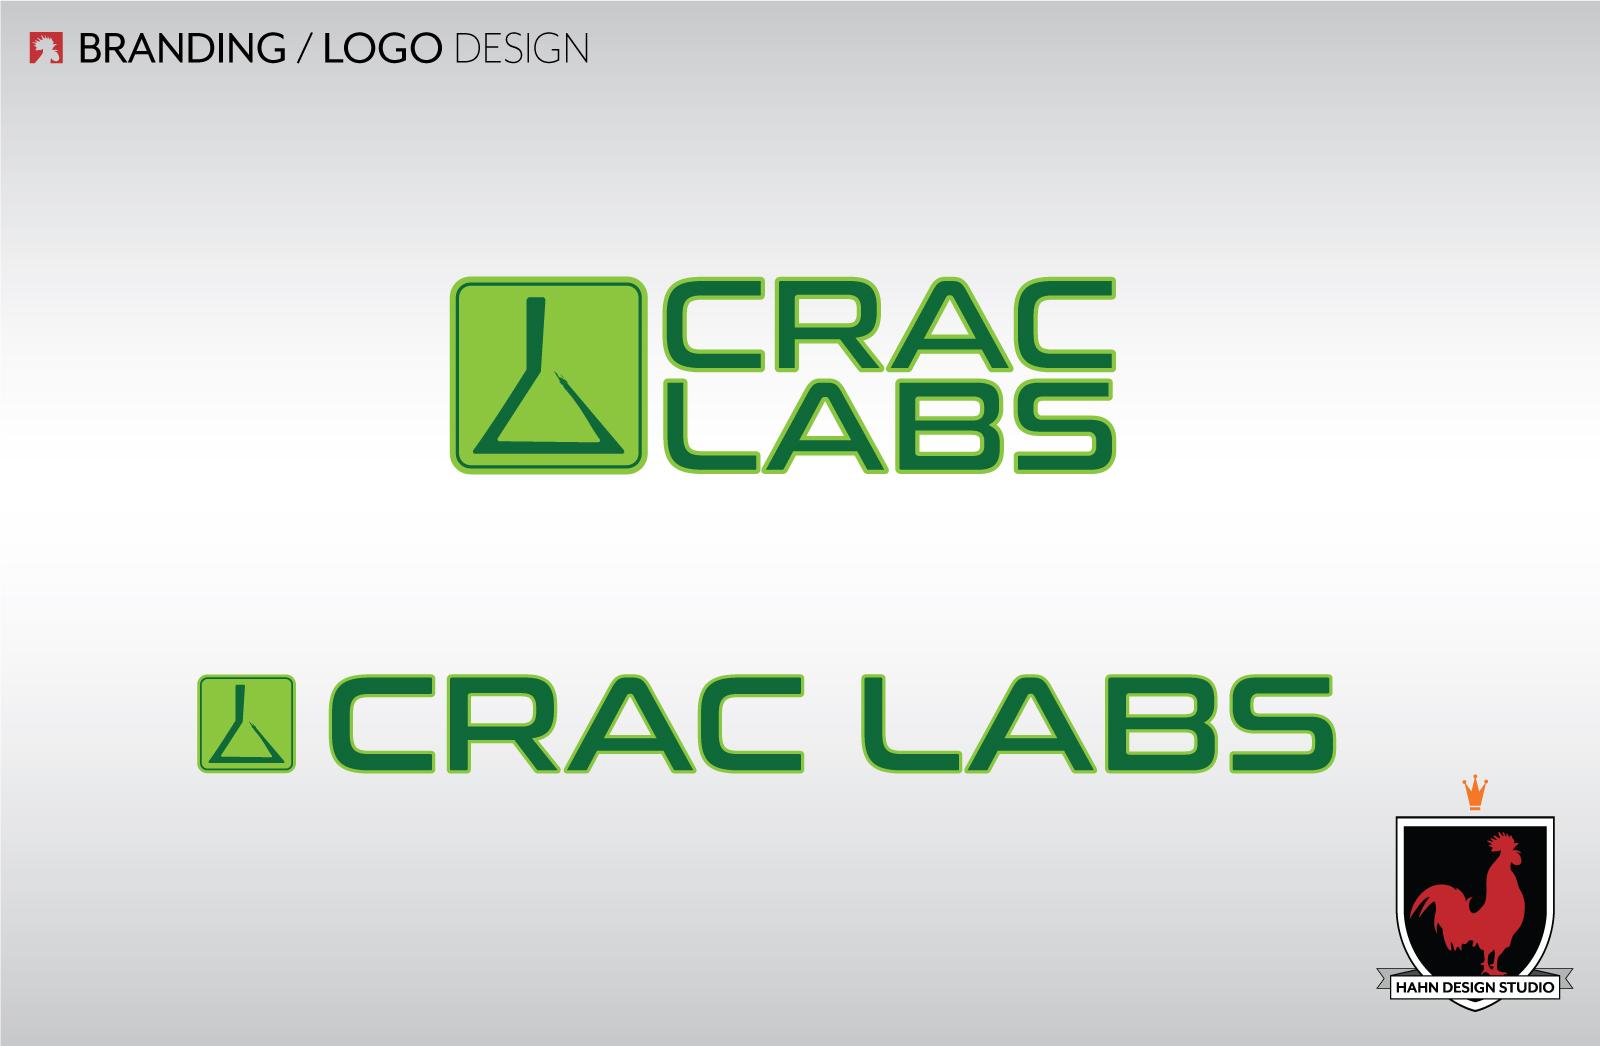 Branding Design for CRAC Labes